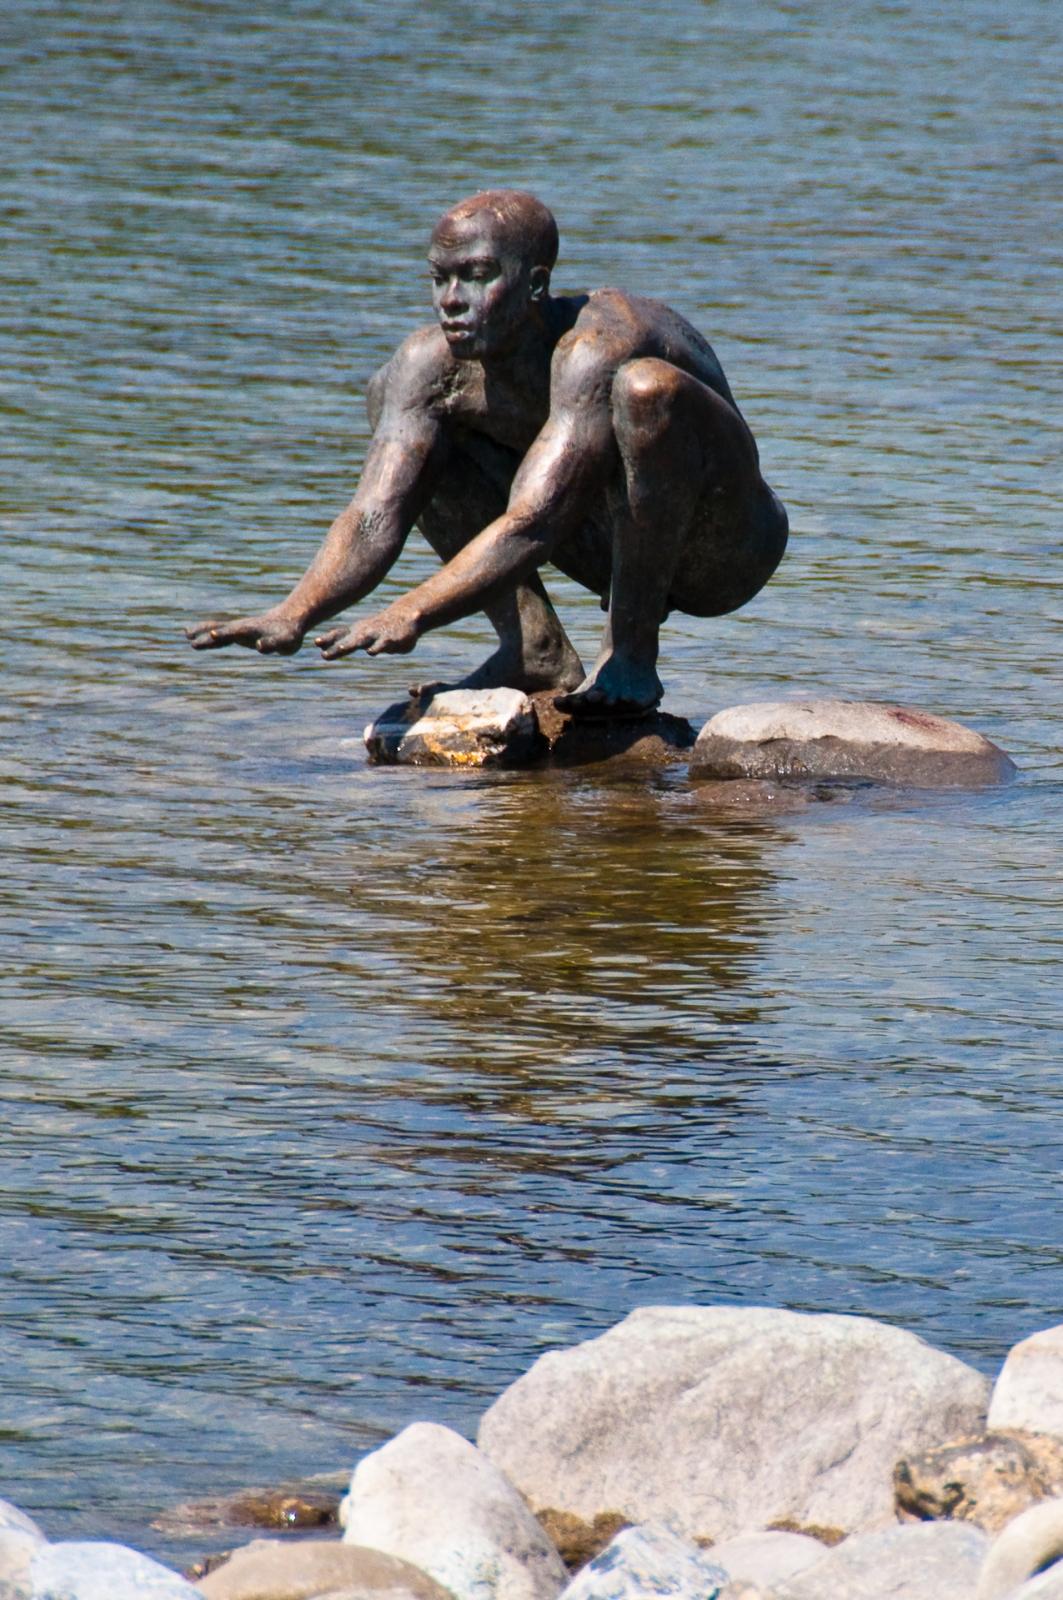 radolfzell staty statue swimmer bodensjön bodensee lake constance